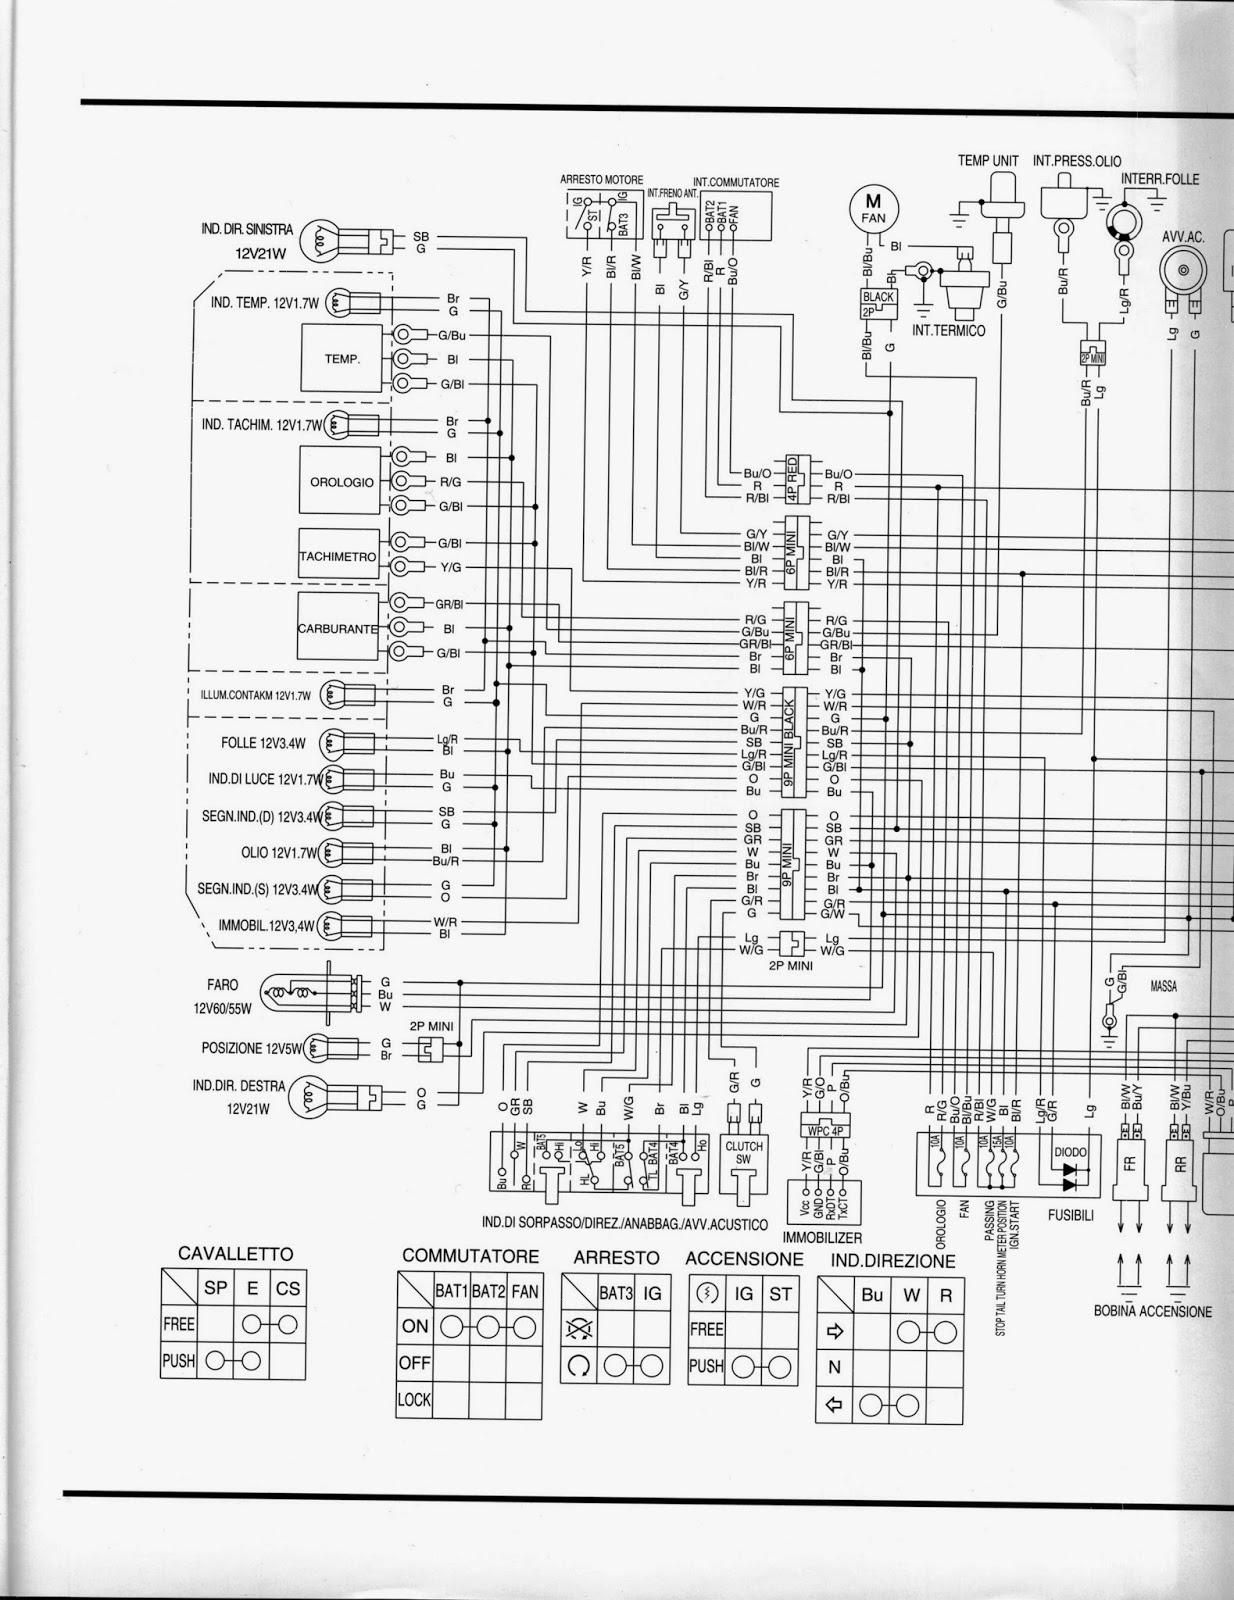 Schema Elettrico Honda Cn Schema Elettrico Per Honda Sh